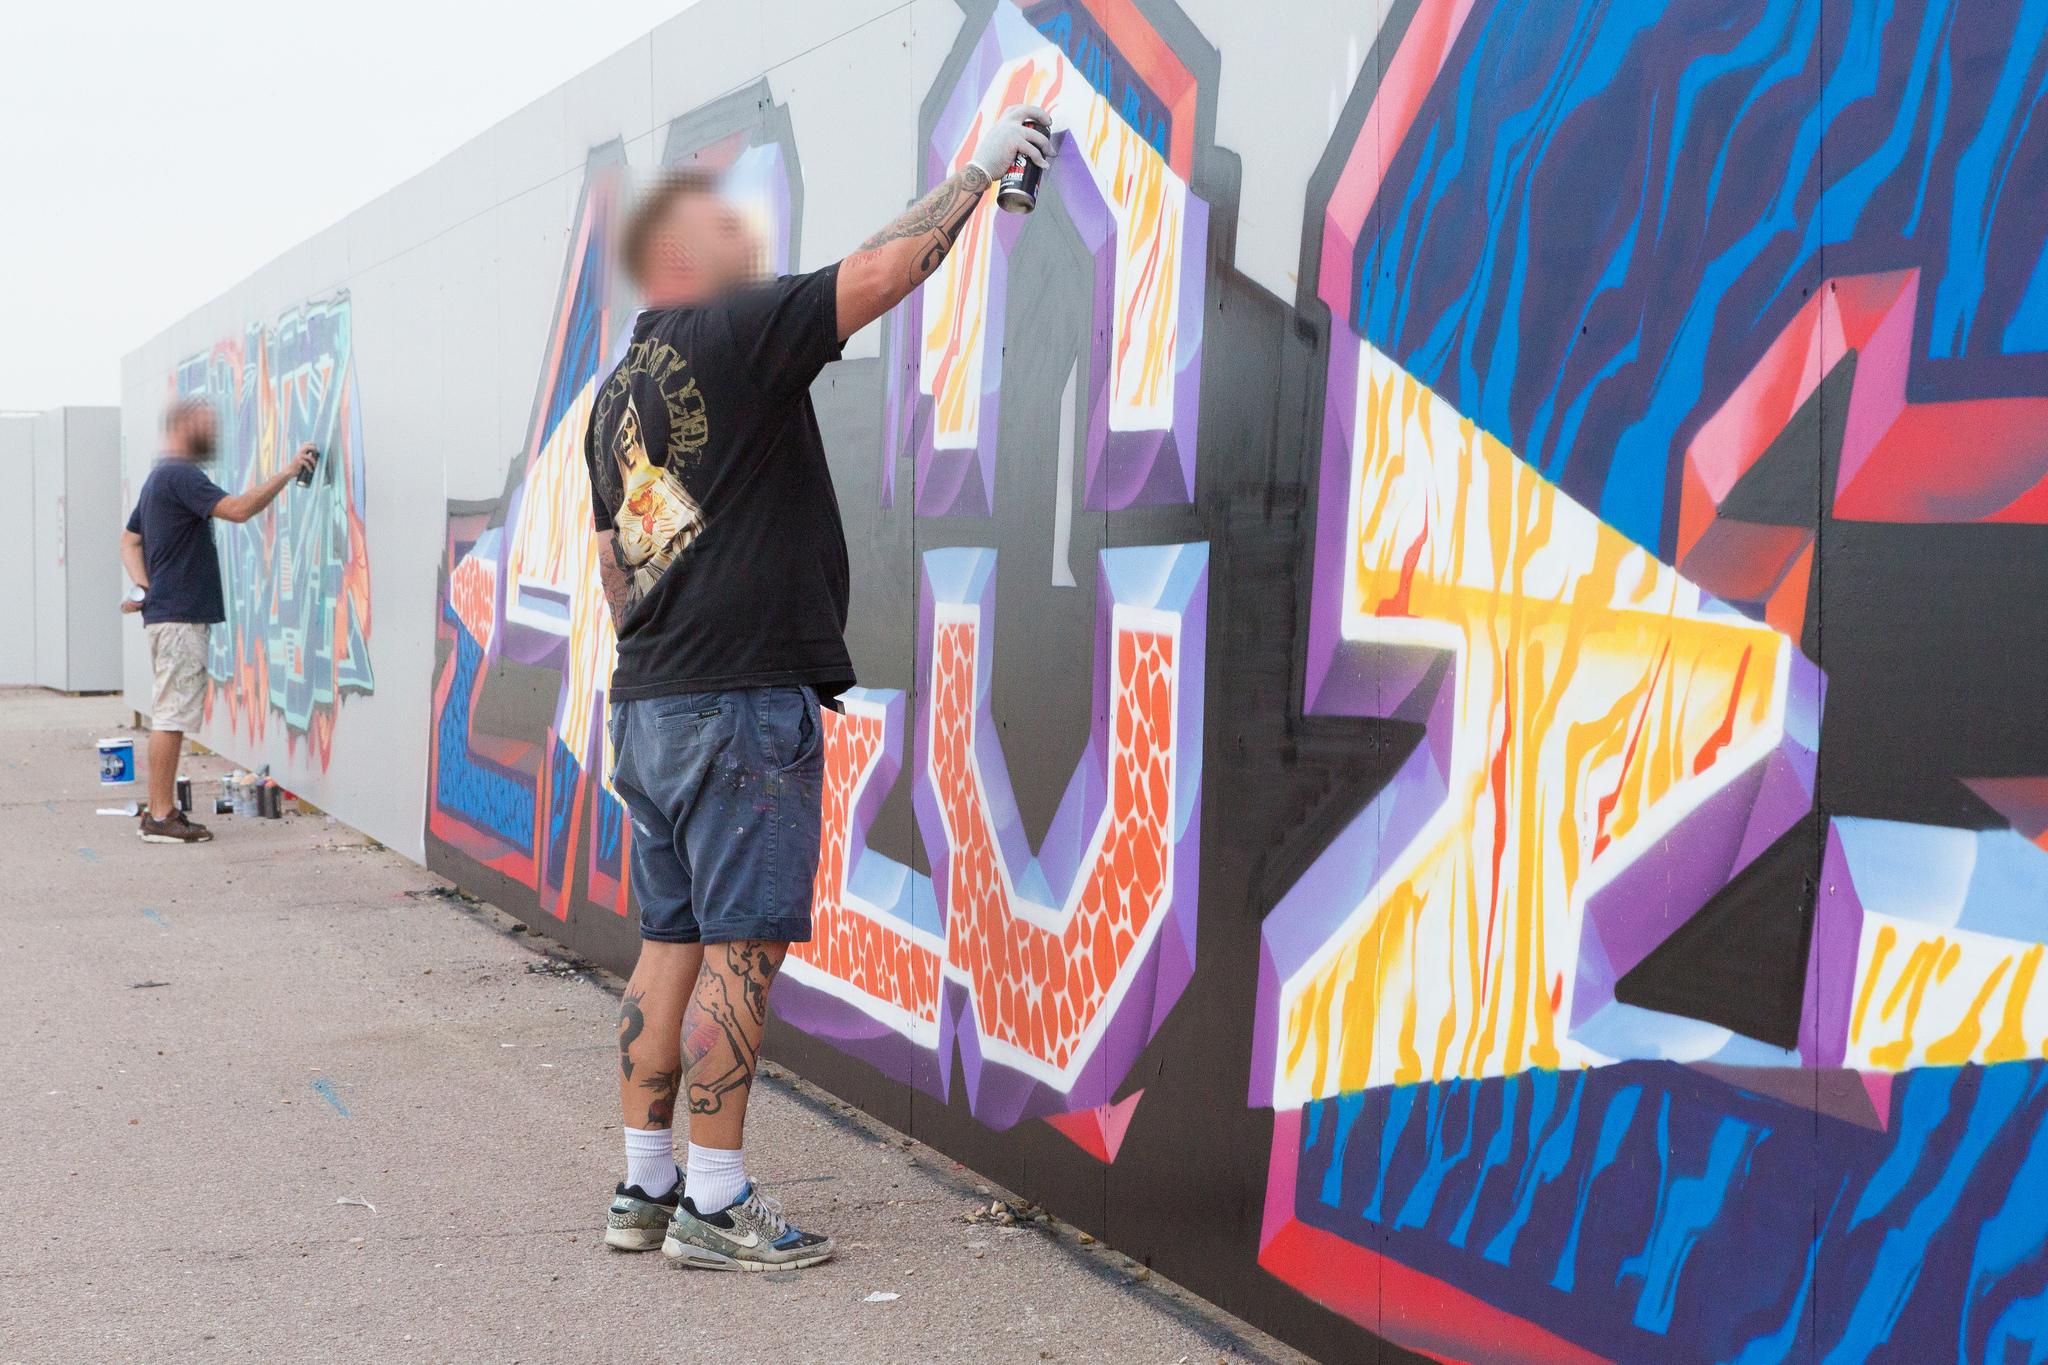 The Brighton Society Graffiti Strategy